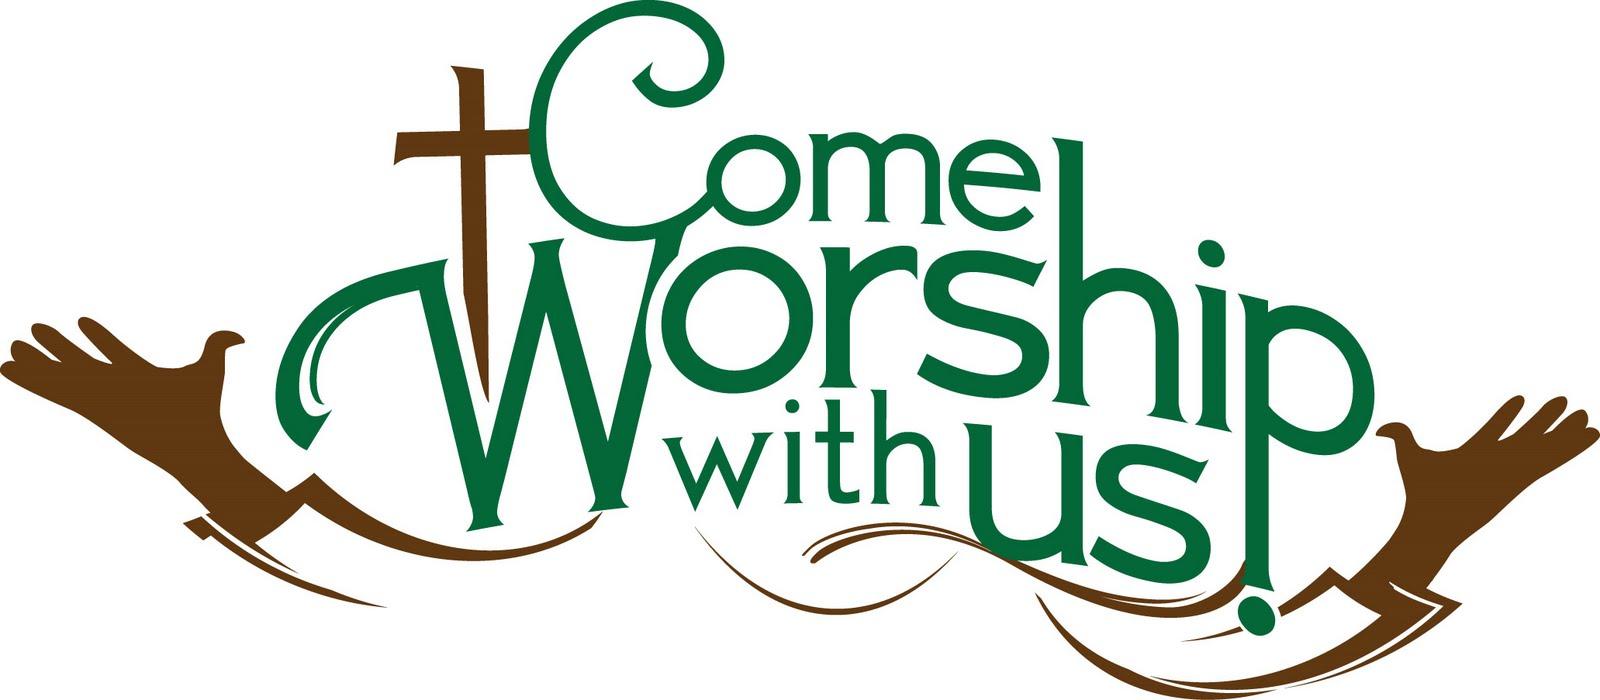 ST. PAUL CHURCH (RUNNYMEDE): November 2010